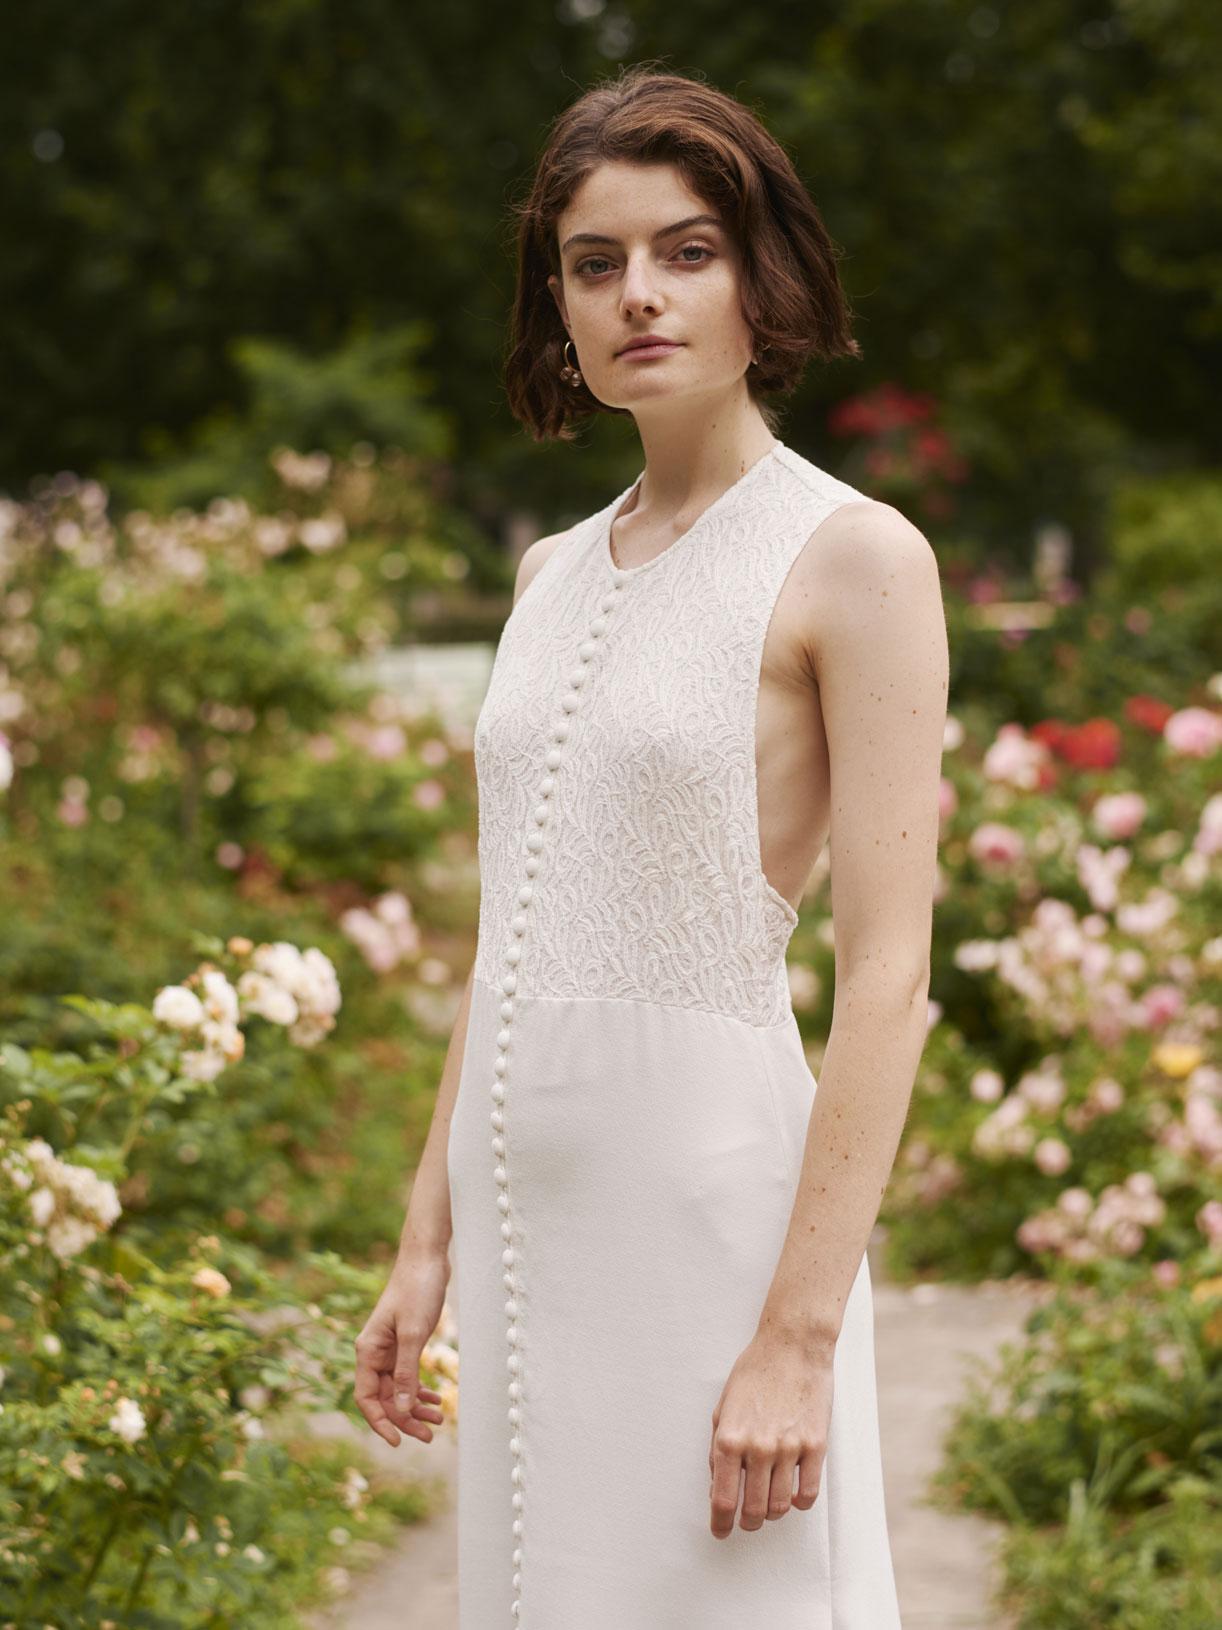 Créatrice de robe de mariée romantique sur-mesure recyclee - Myphilo